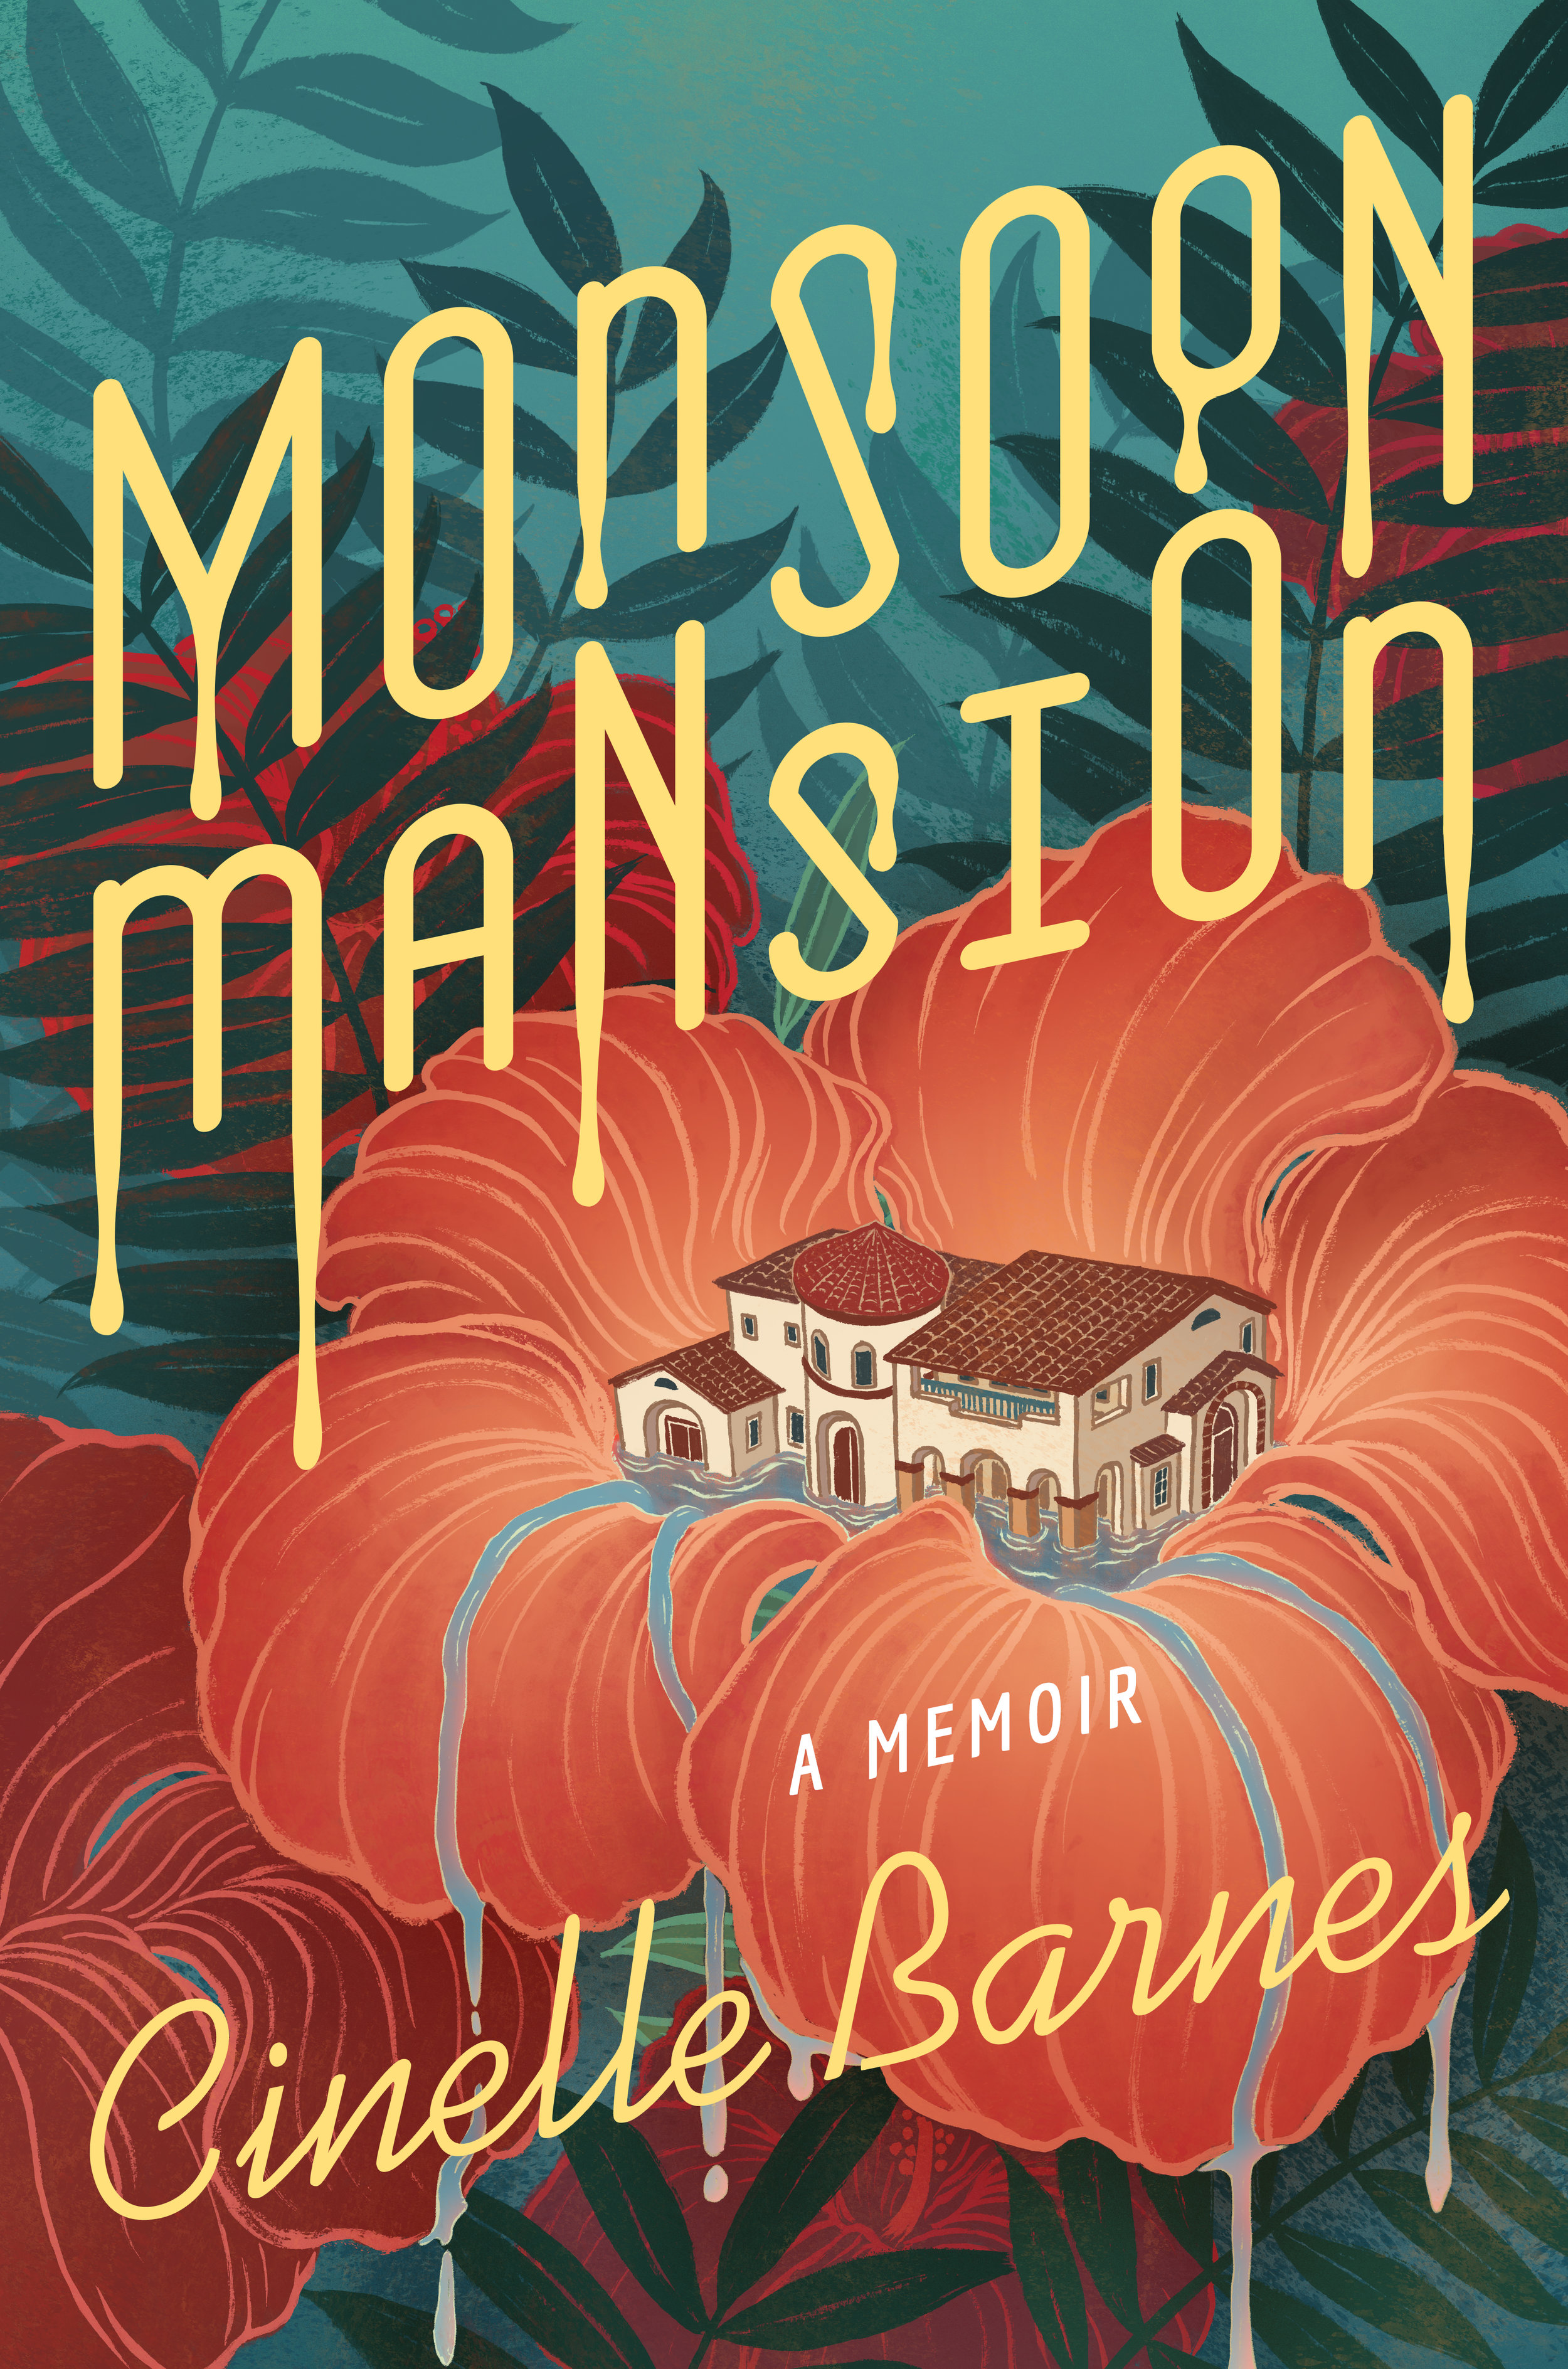 Barnes-Monsoon Mansion_Front Cover.jpg